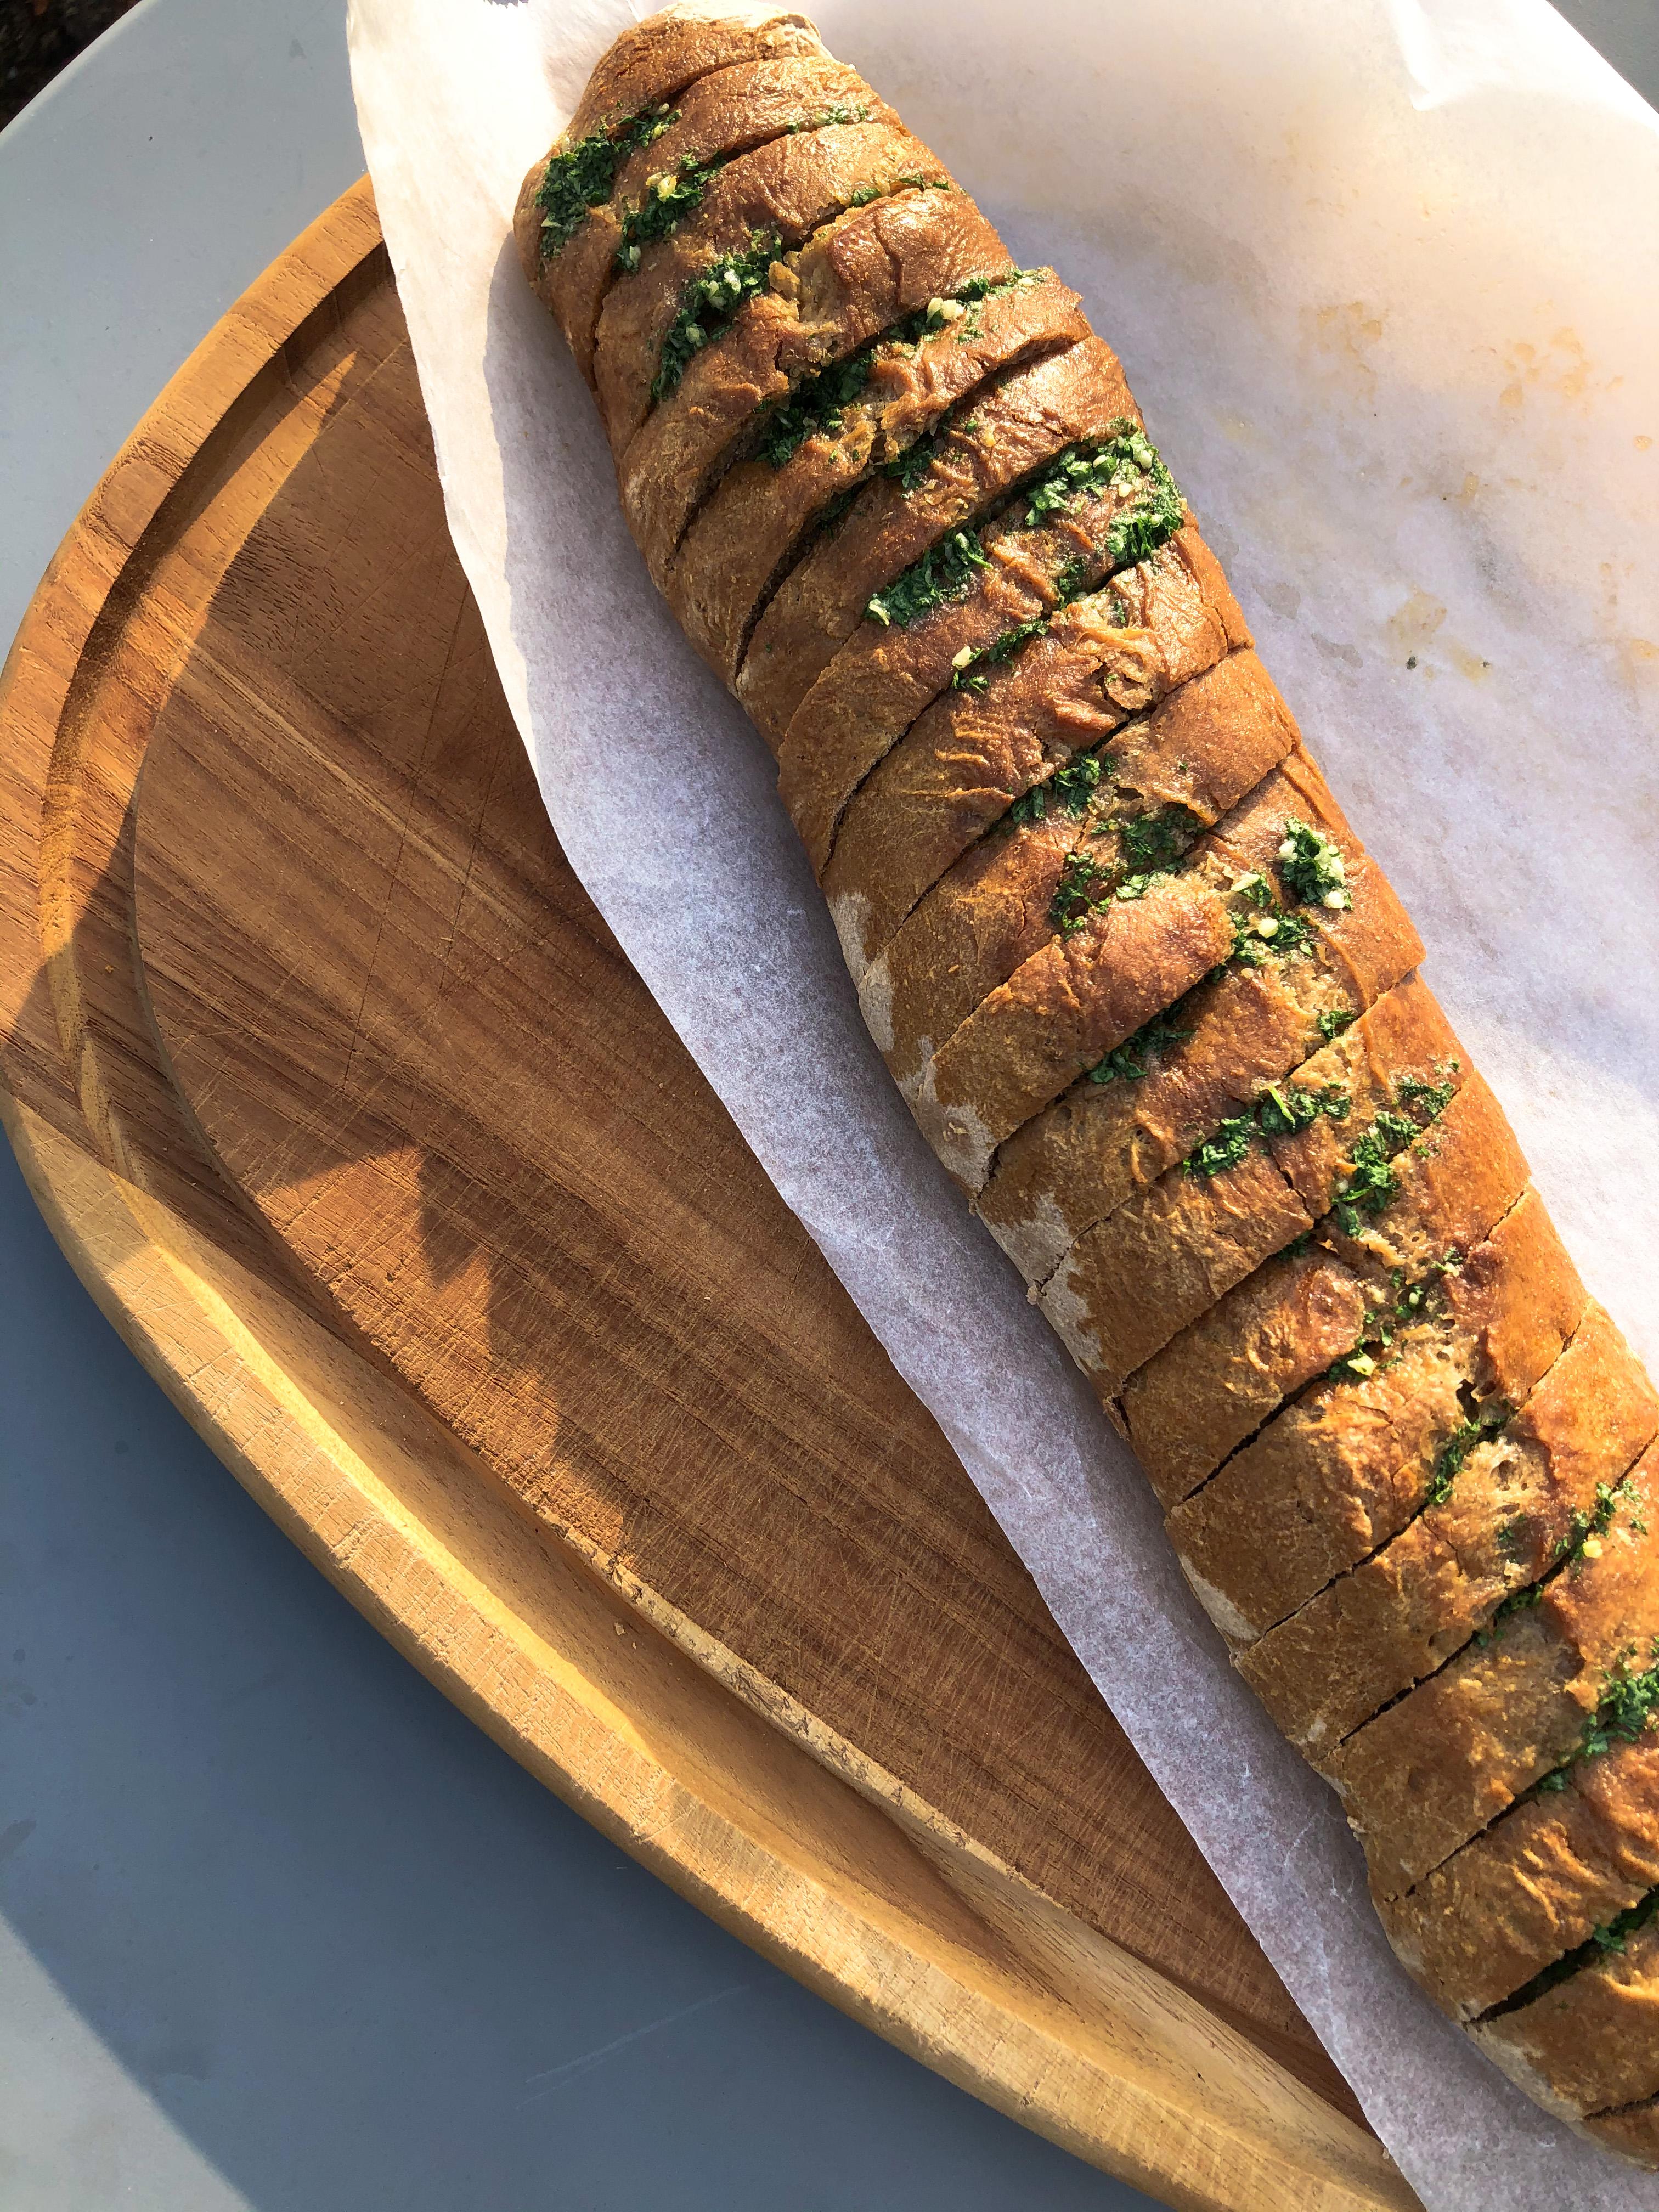 Garlic flute with 05 Agrain® Smoked Super Grain Flour